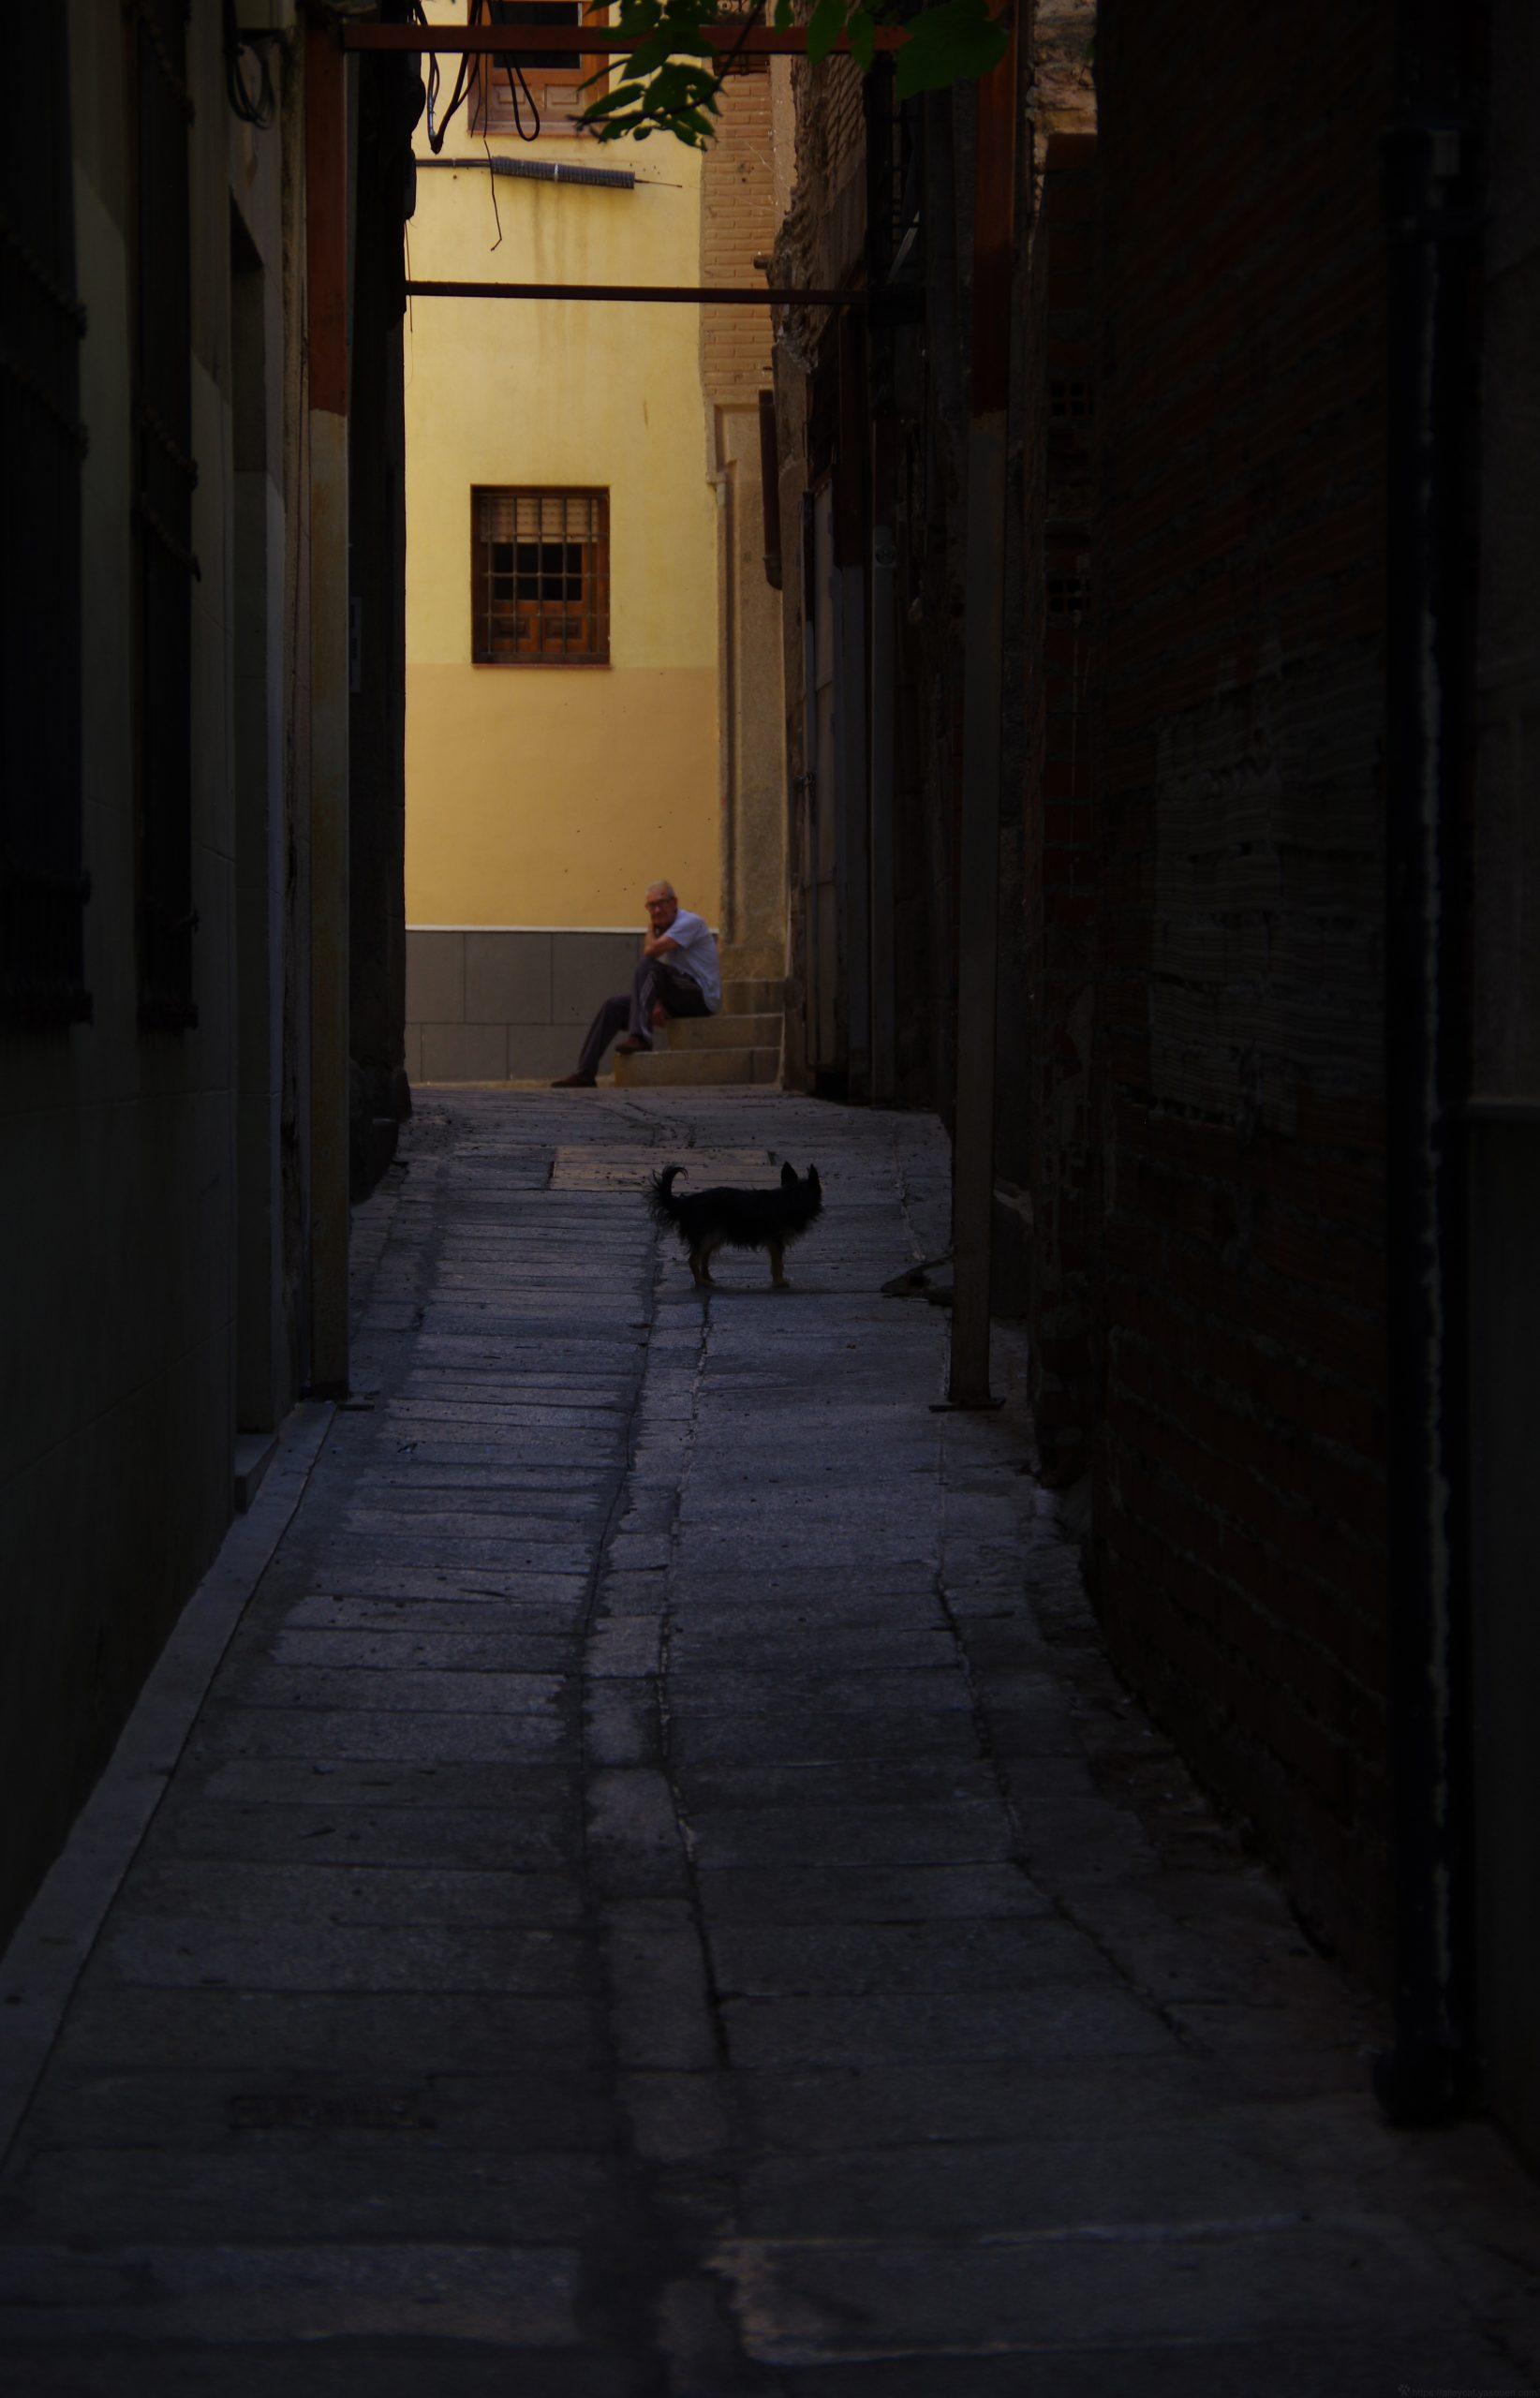 Toledo, Spain, 2017